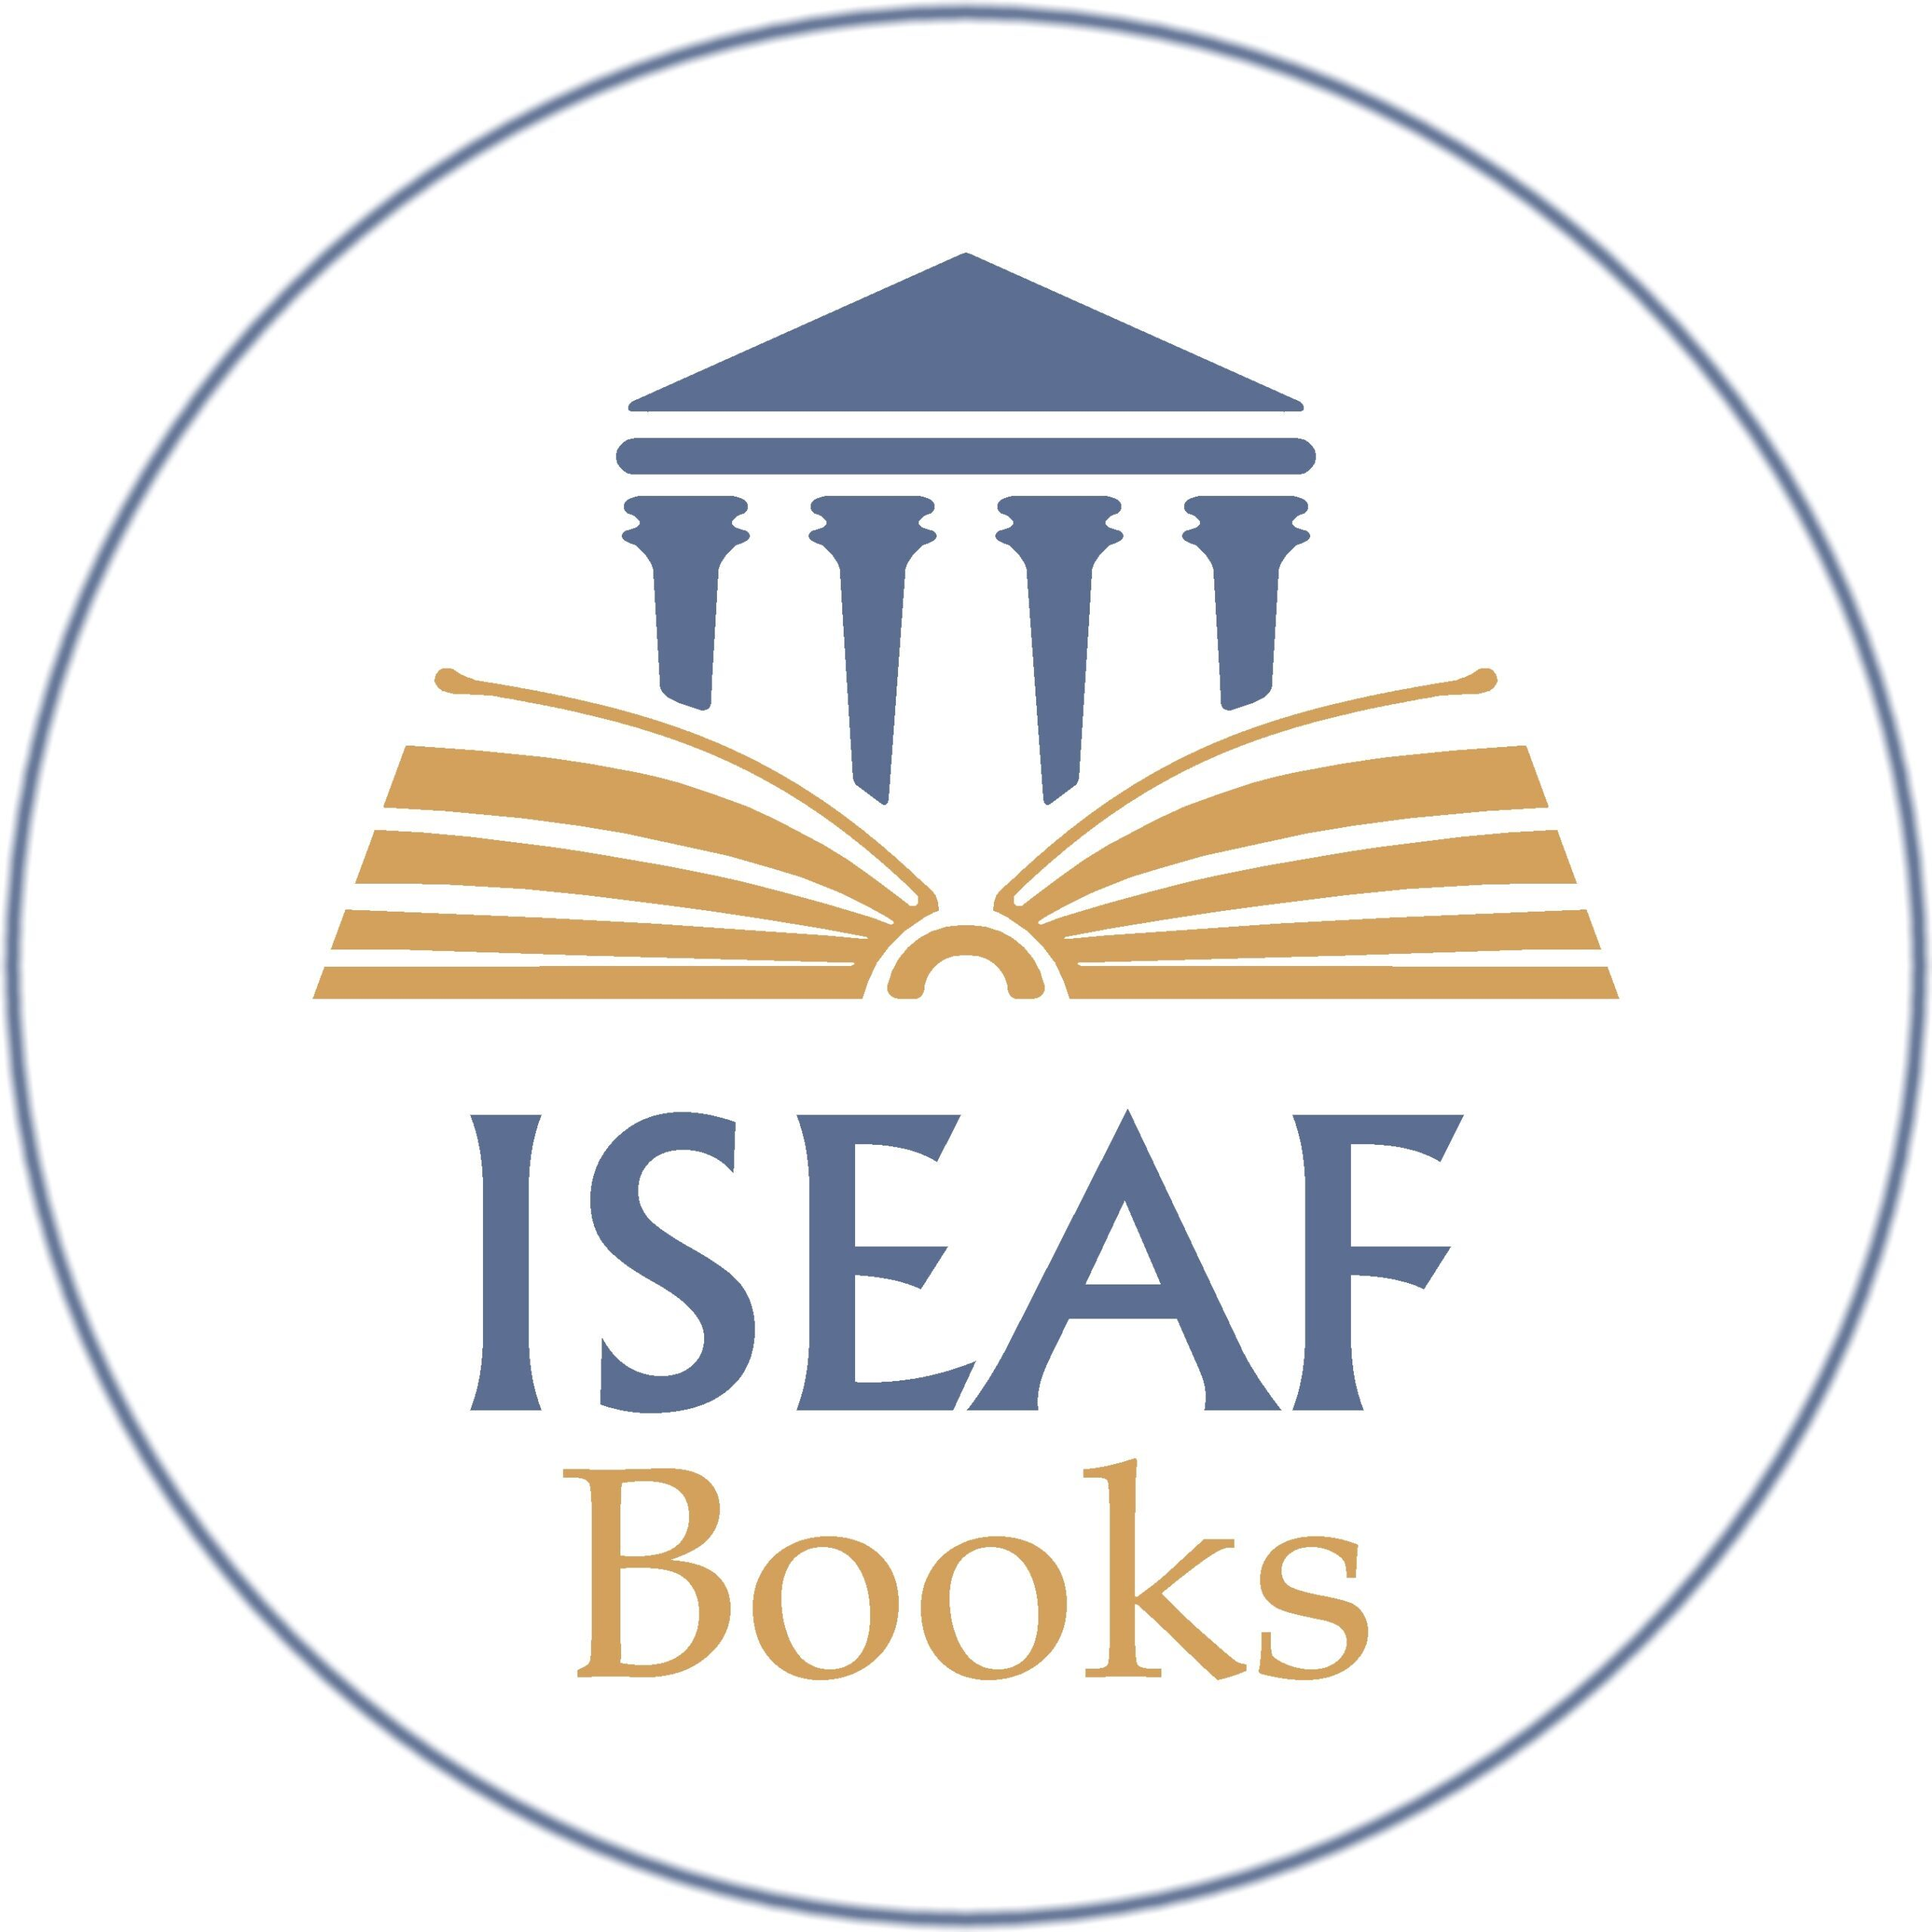 ISEAF Books